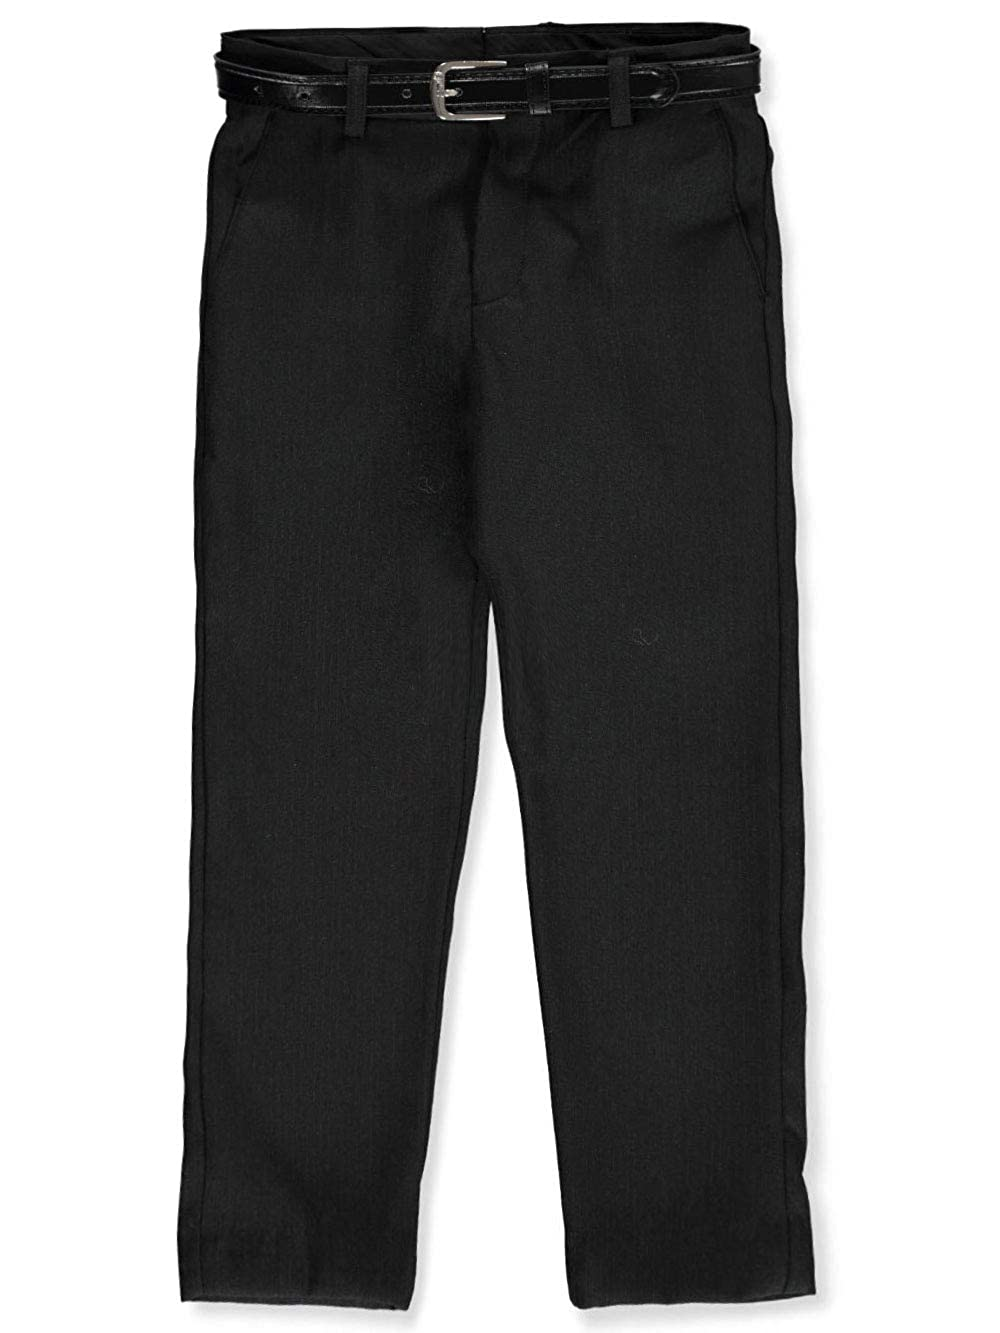 Alberto Danelli Boys Belted Flat Front Dress Pants